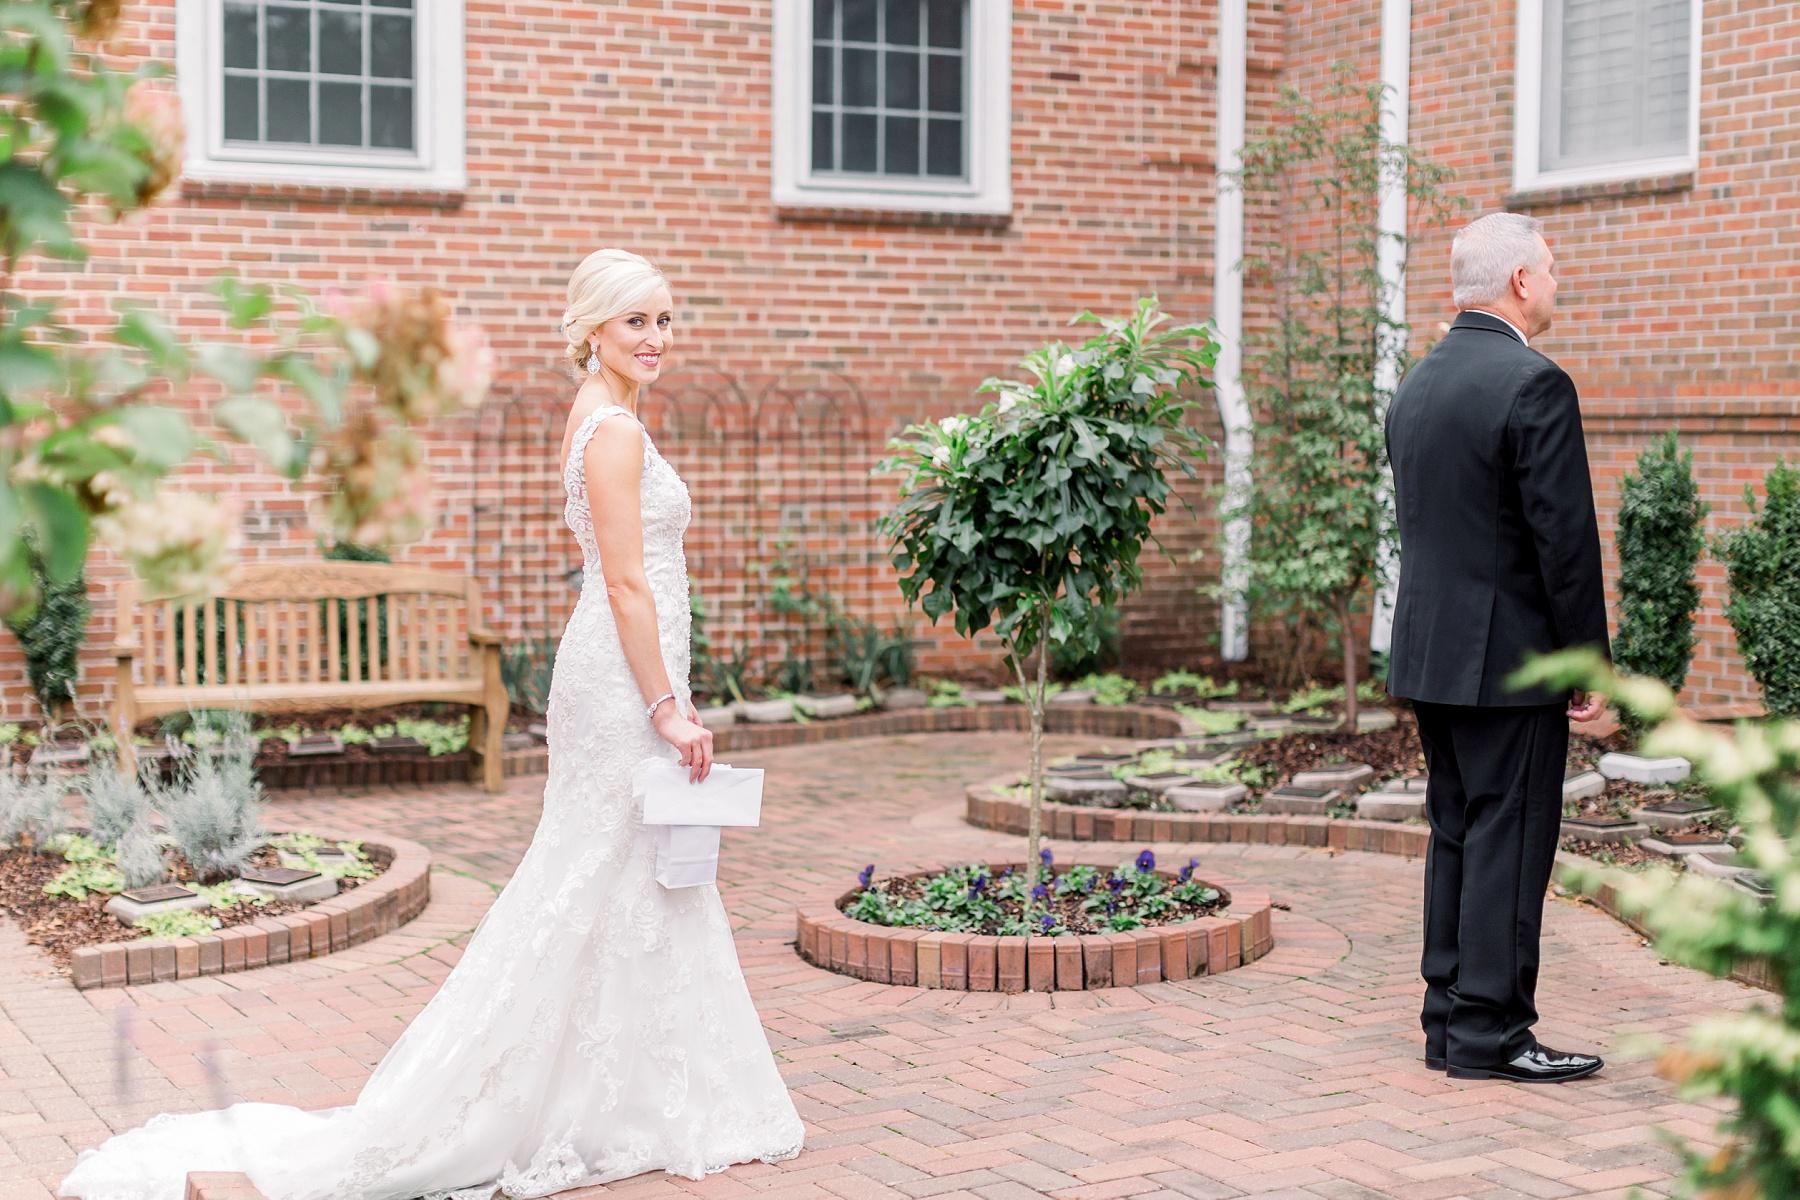 midwest-adventurous-wedding-photographer-elizabeth-ladean-photography-photo_4703.jpg